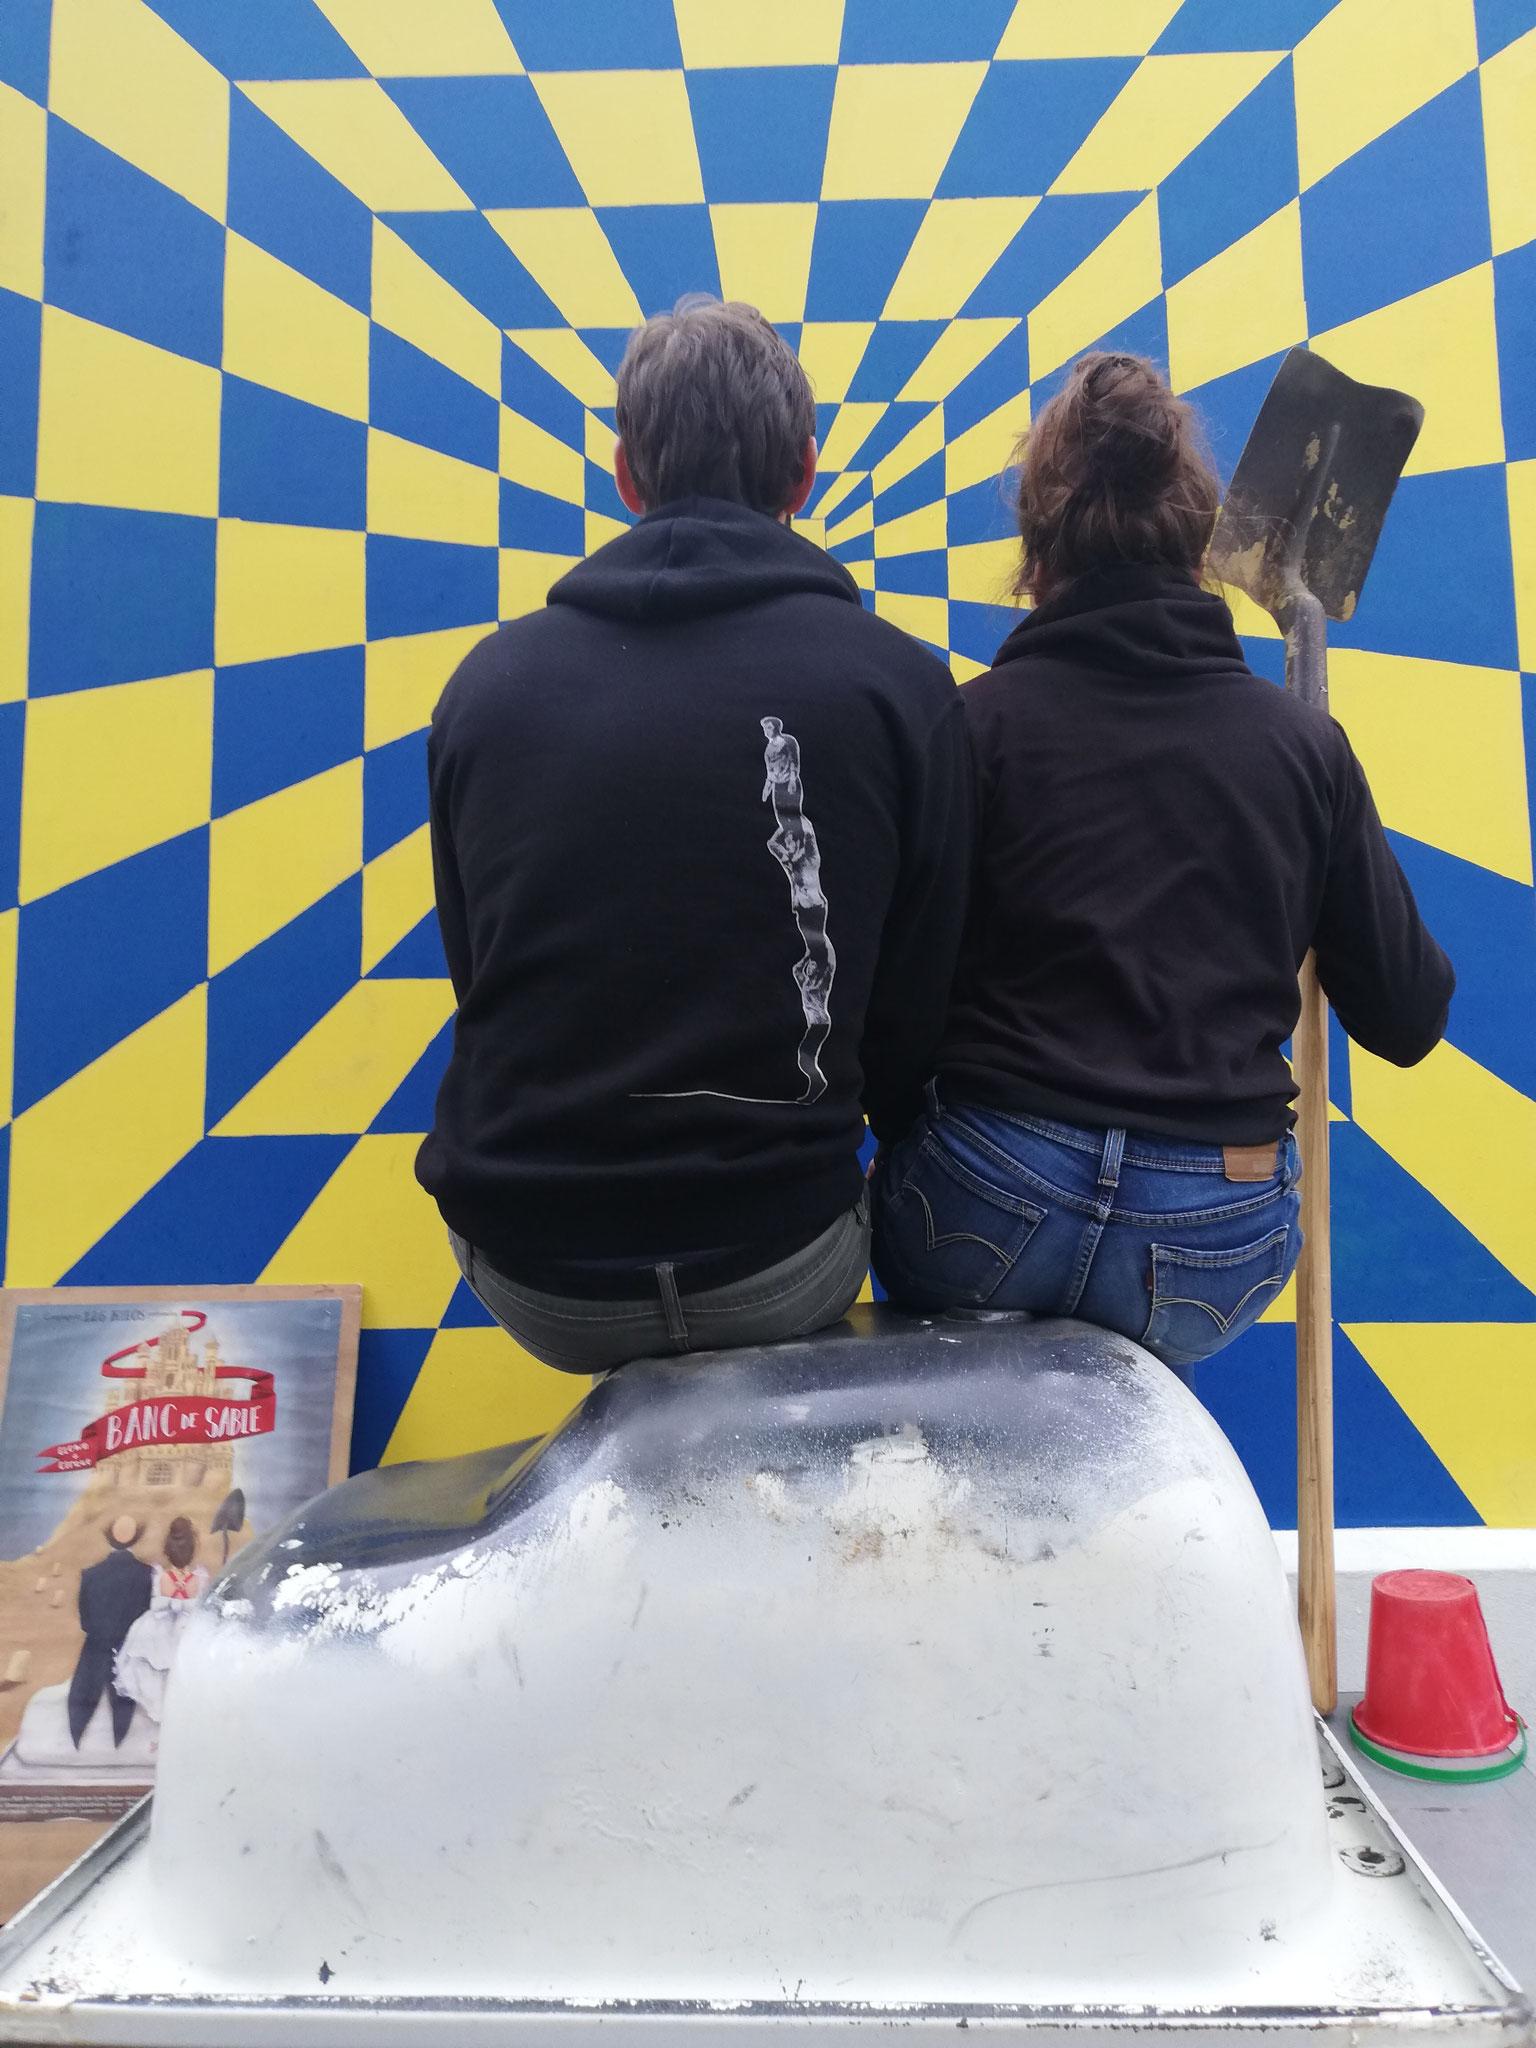 Sainte-Savine (10), festival des arts de la rue, septembre 2019